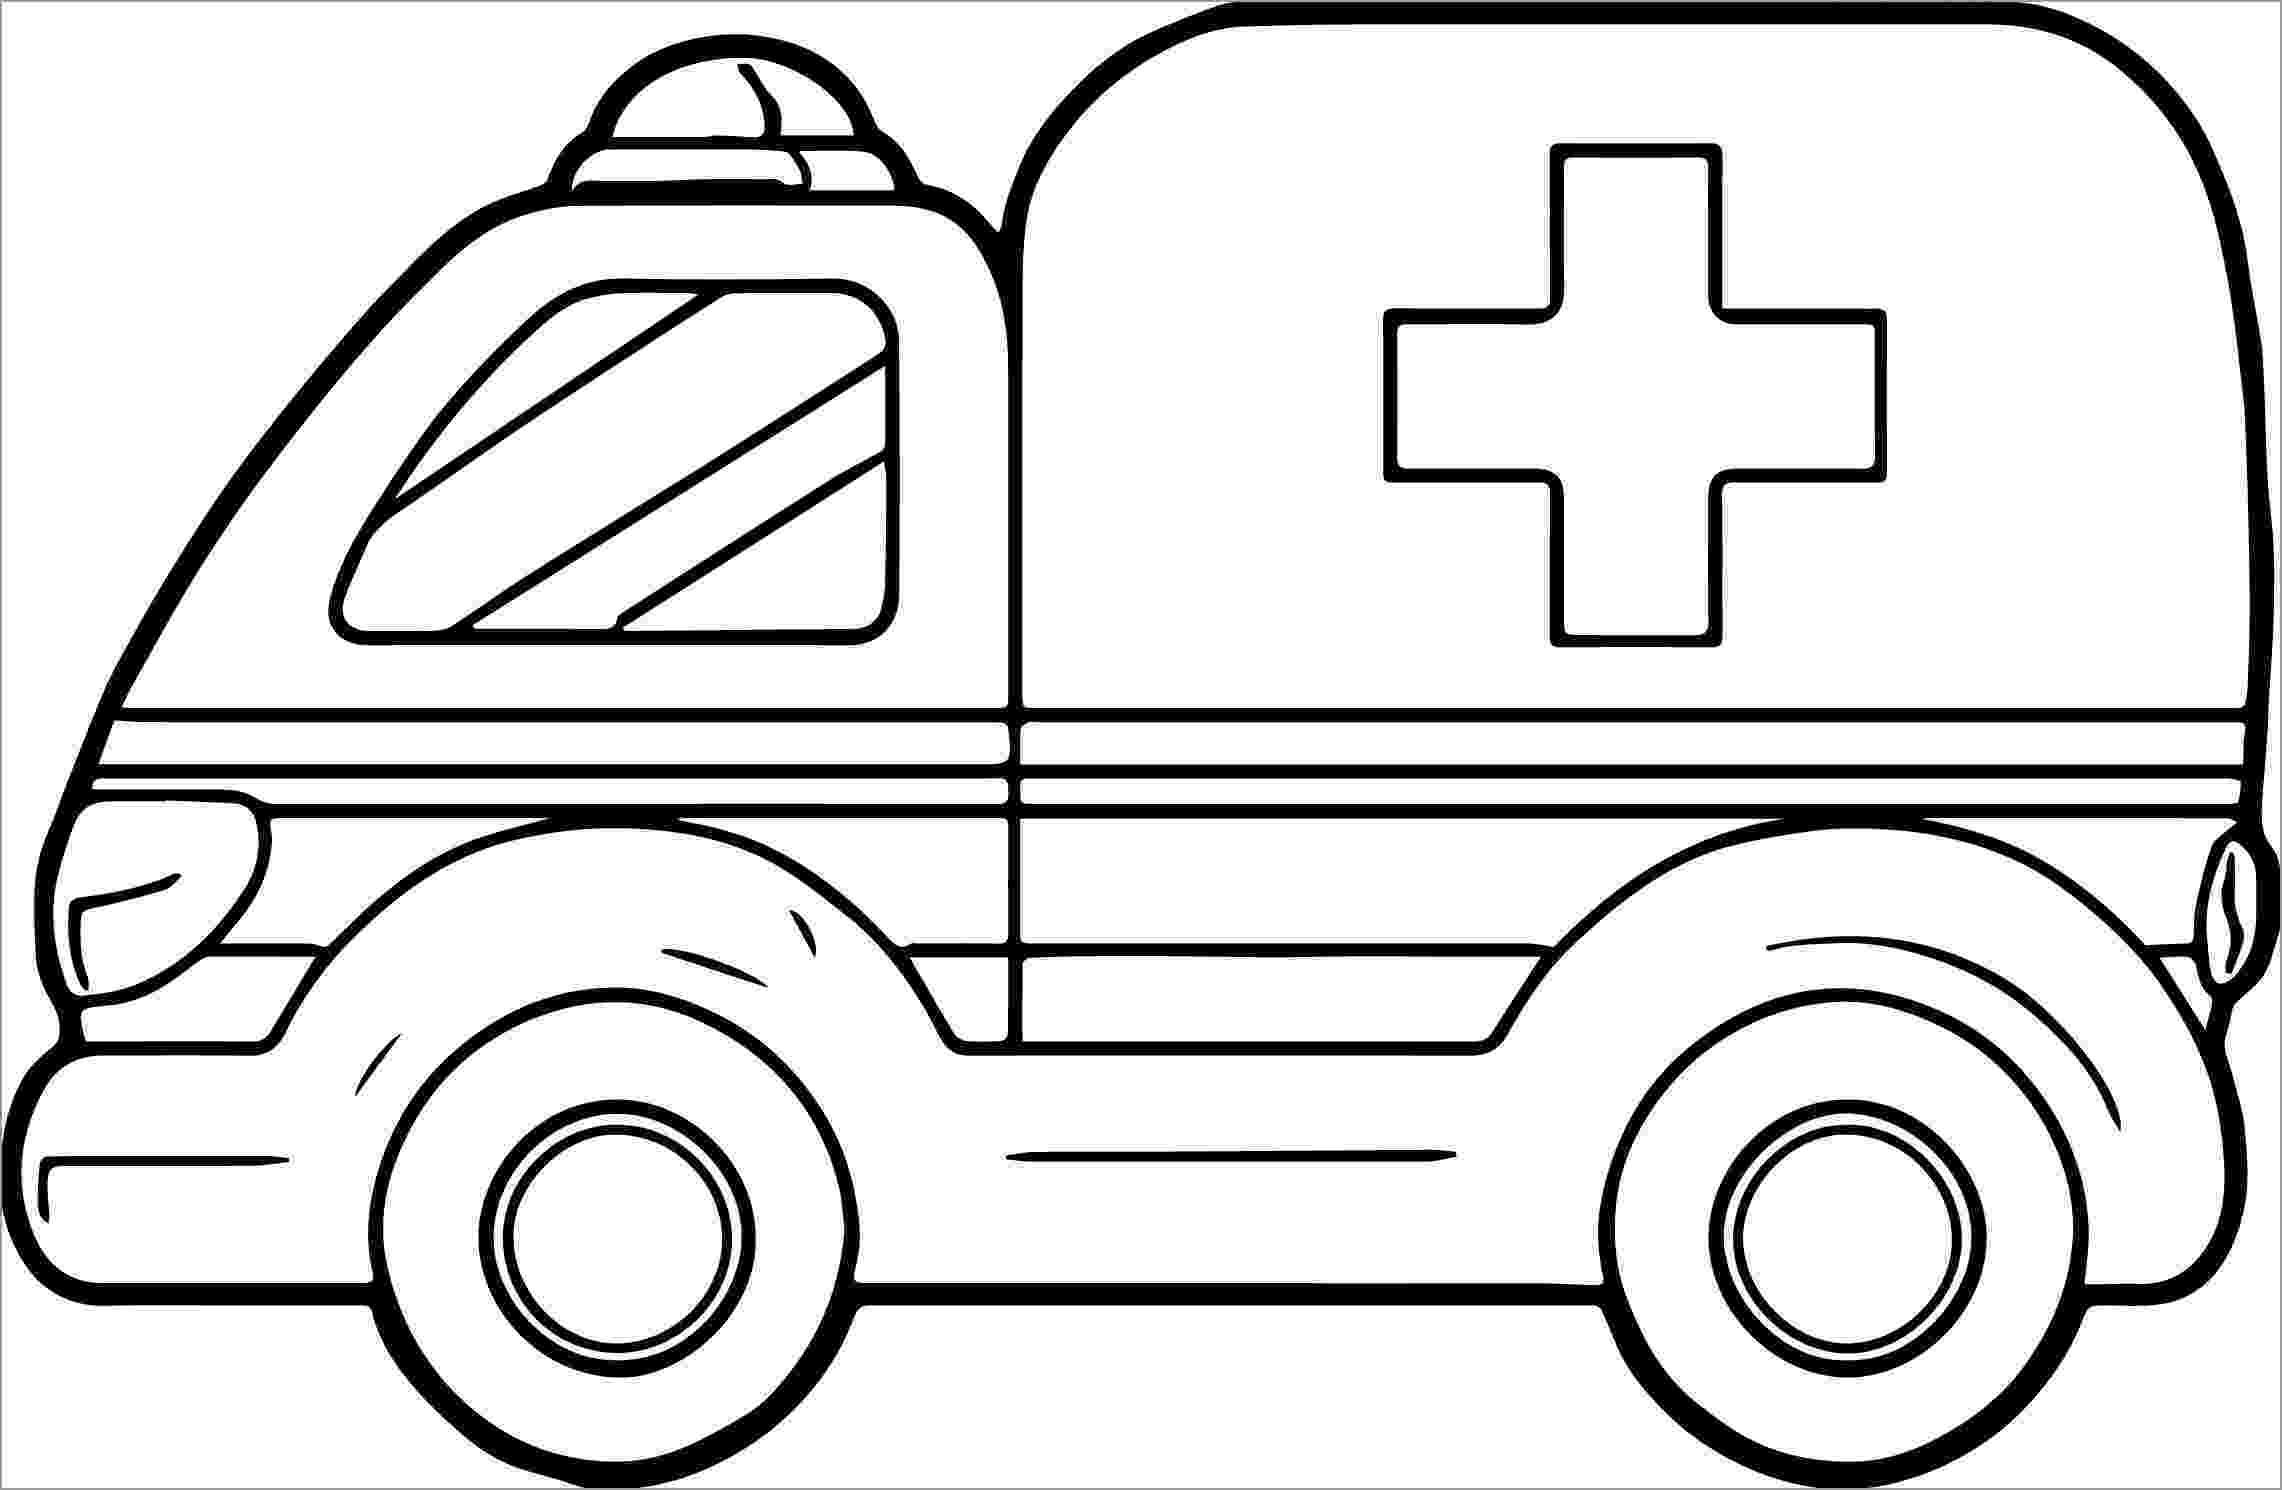 ambulance colouring pages ambulance coloring pages coloringbay colouring ambulance pages